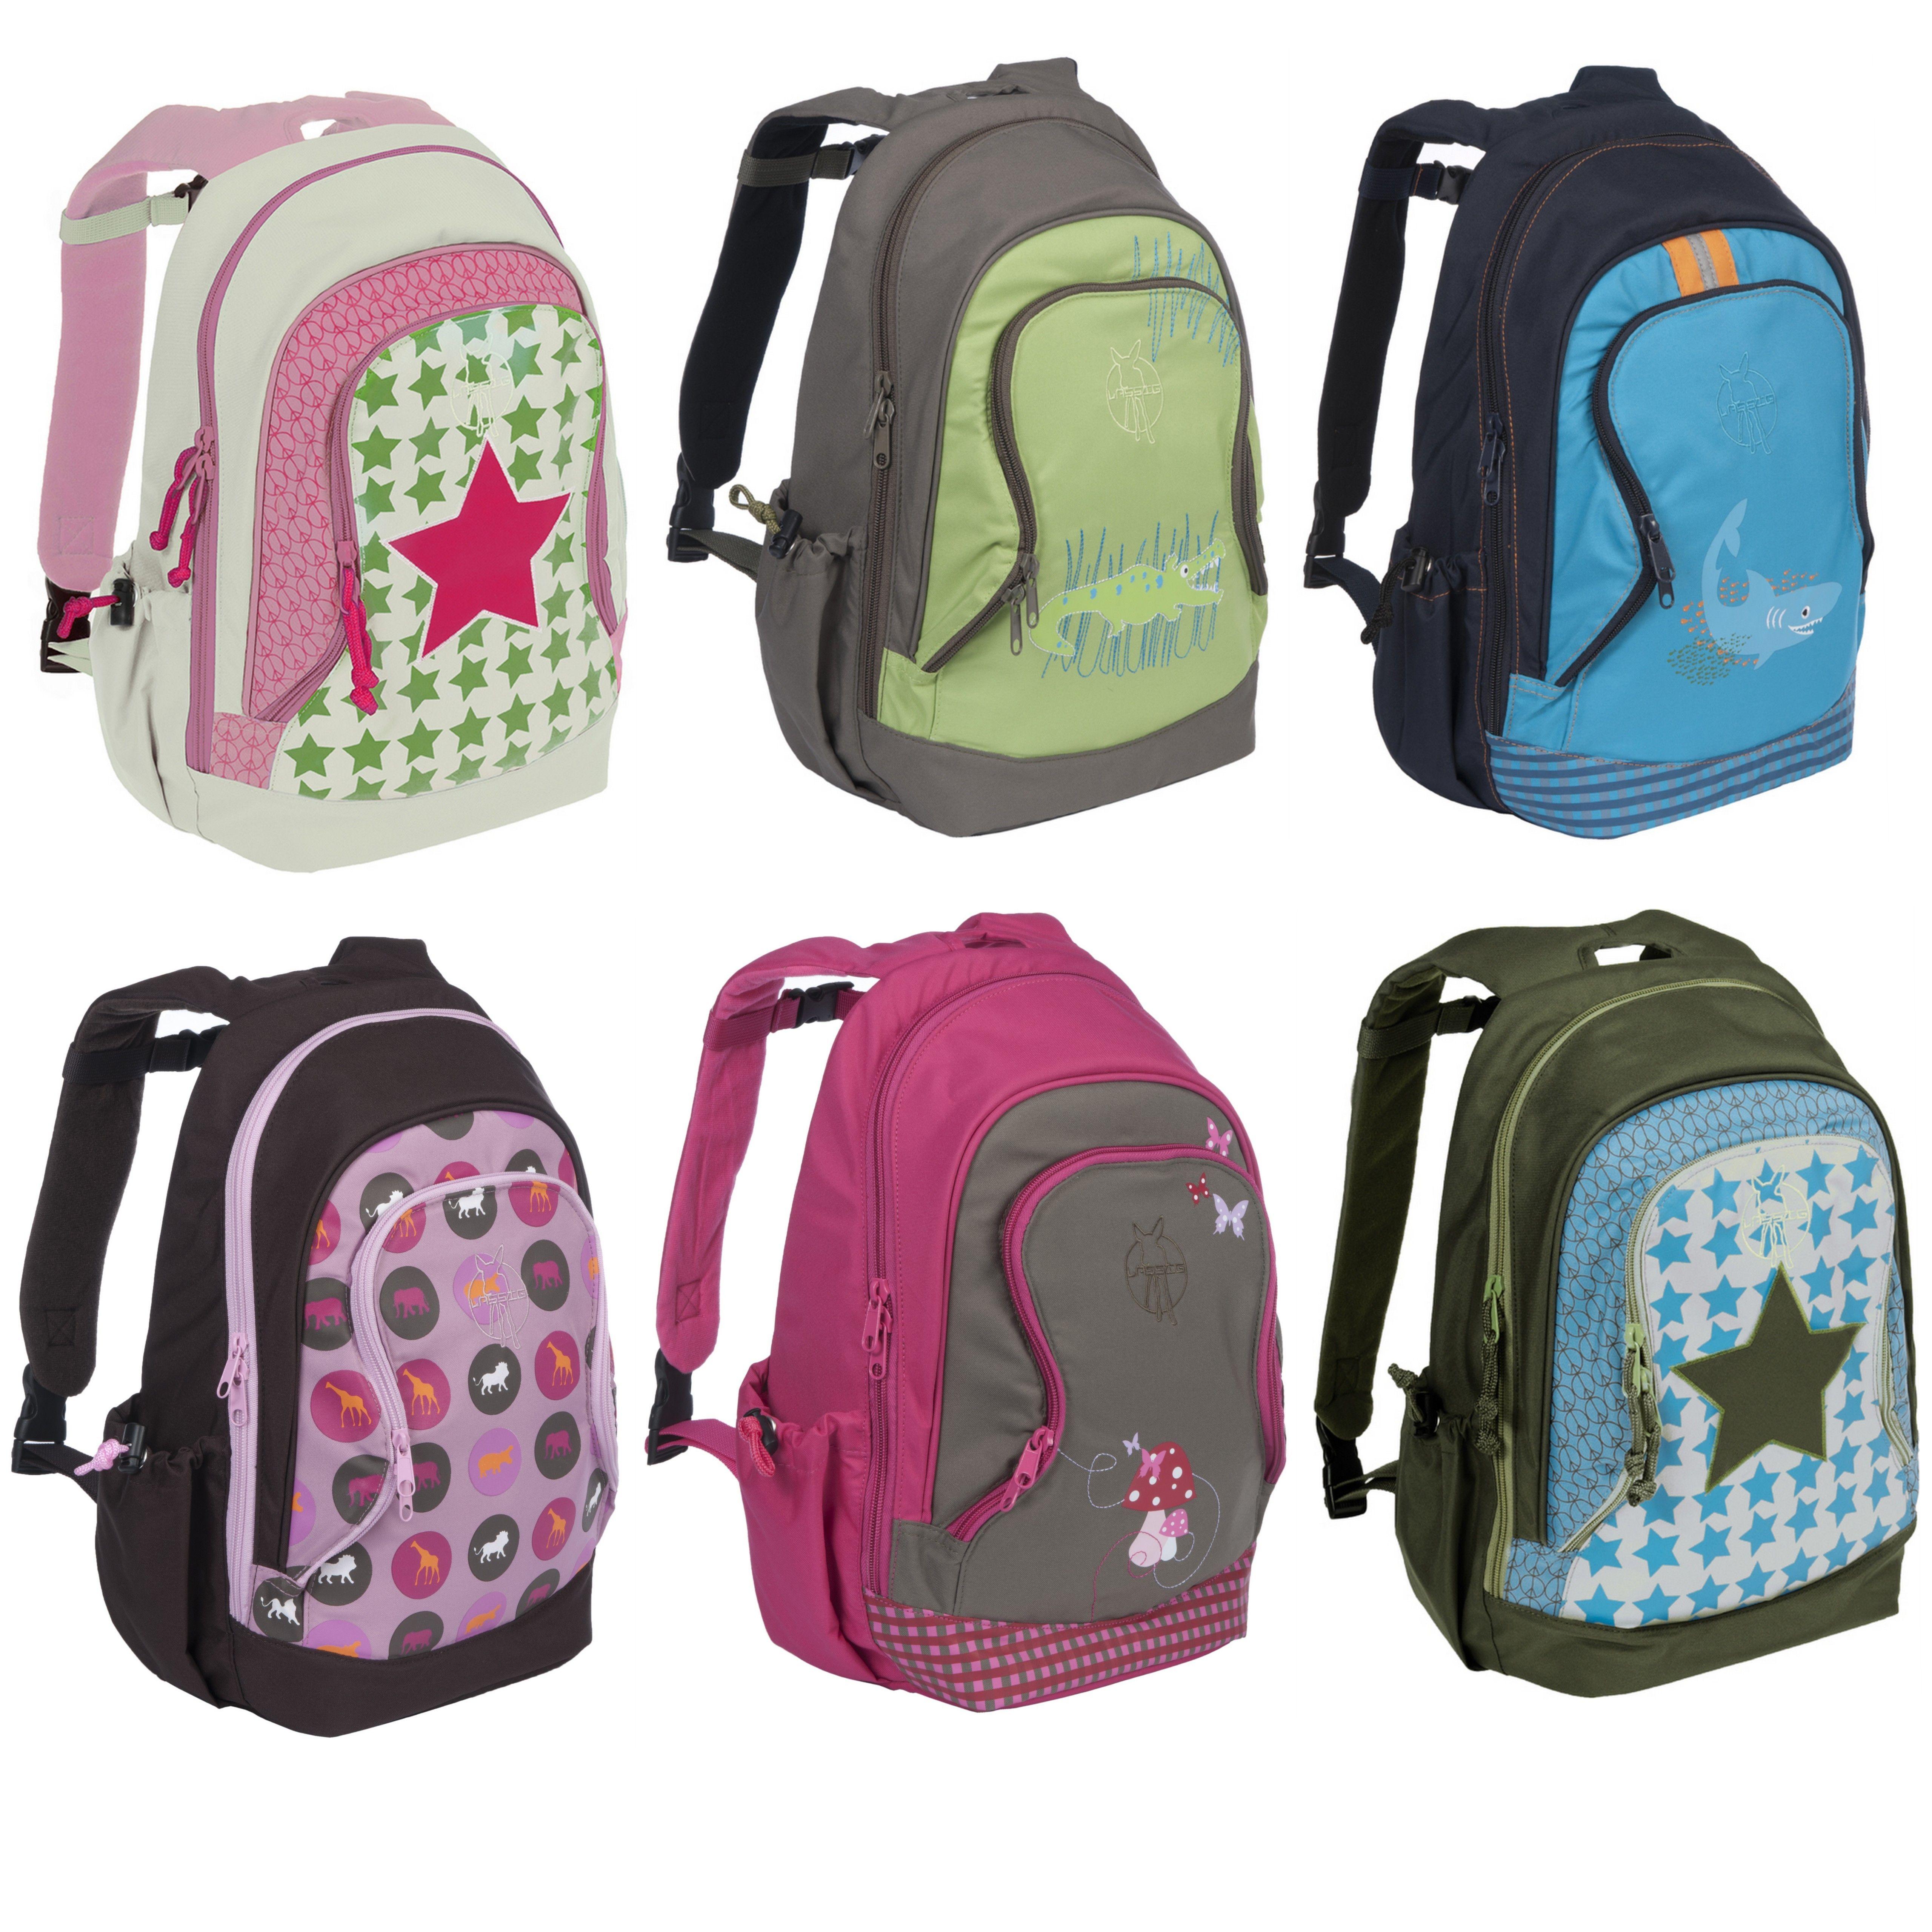 d9cf1a85d0 Lassig 4Kids Backpacks - Travel and School Bag